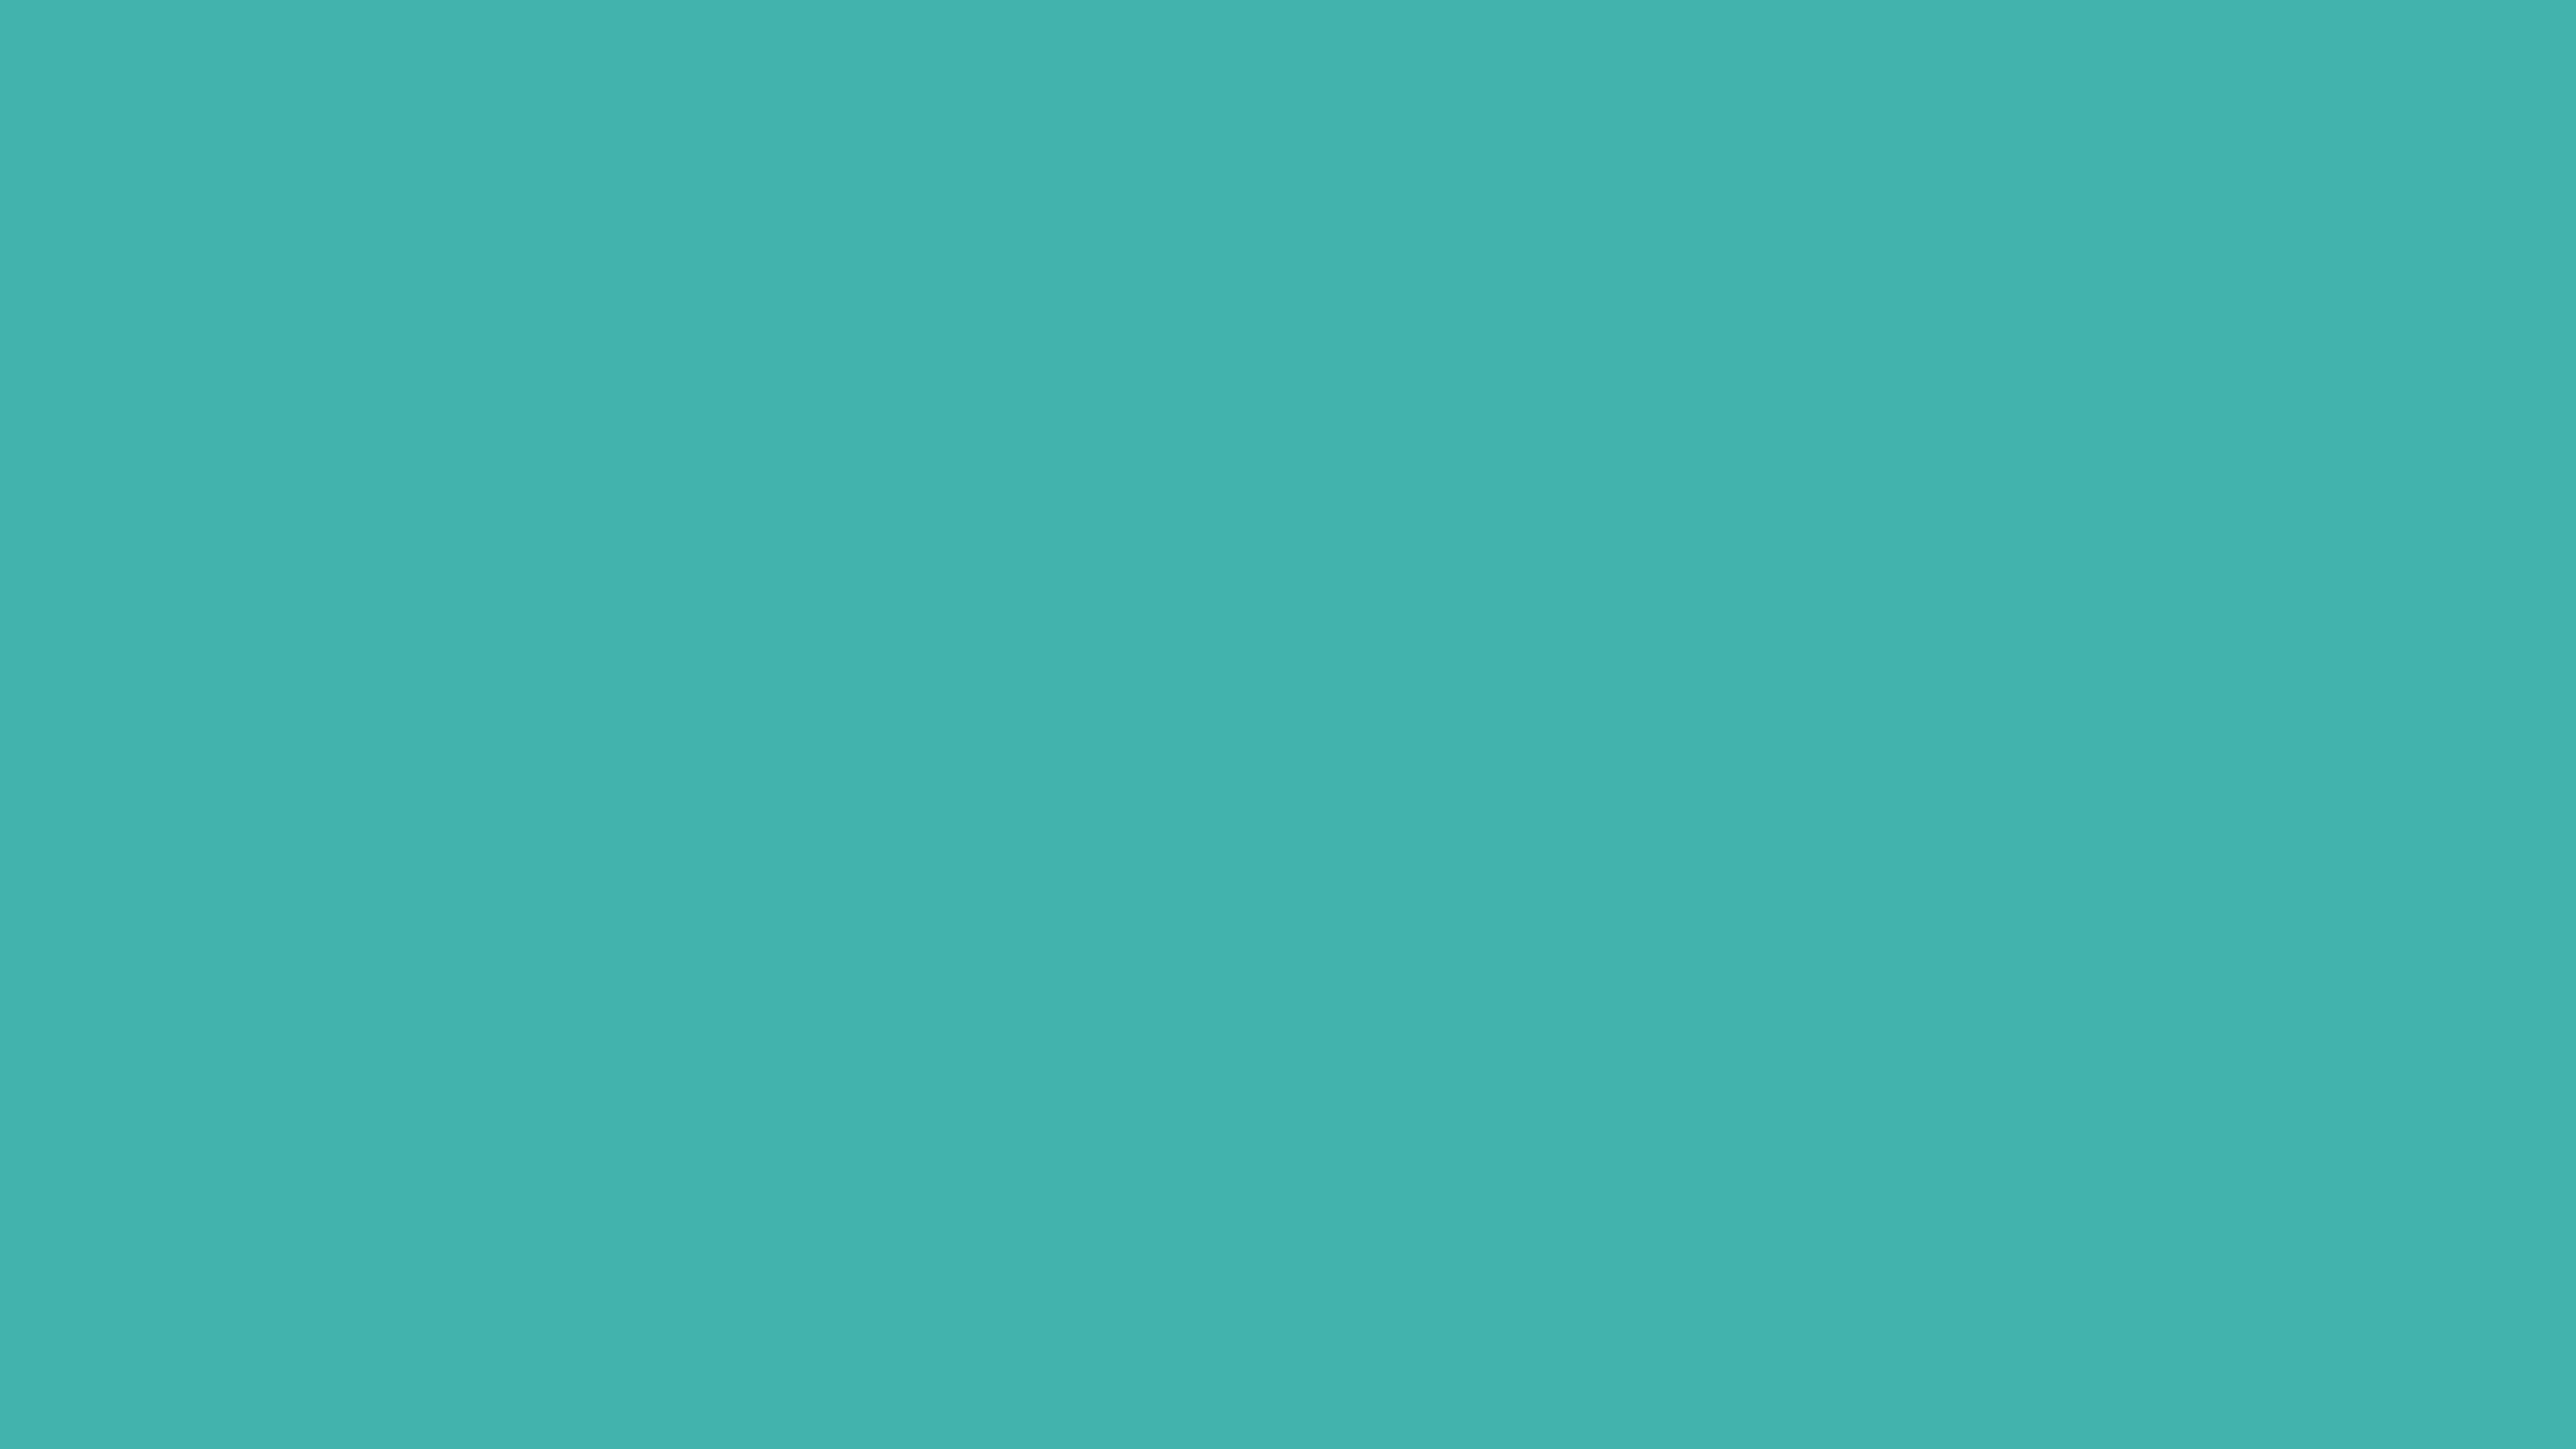 5120x2880 Verdigris Solid Color Background